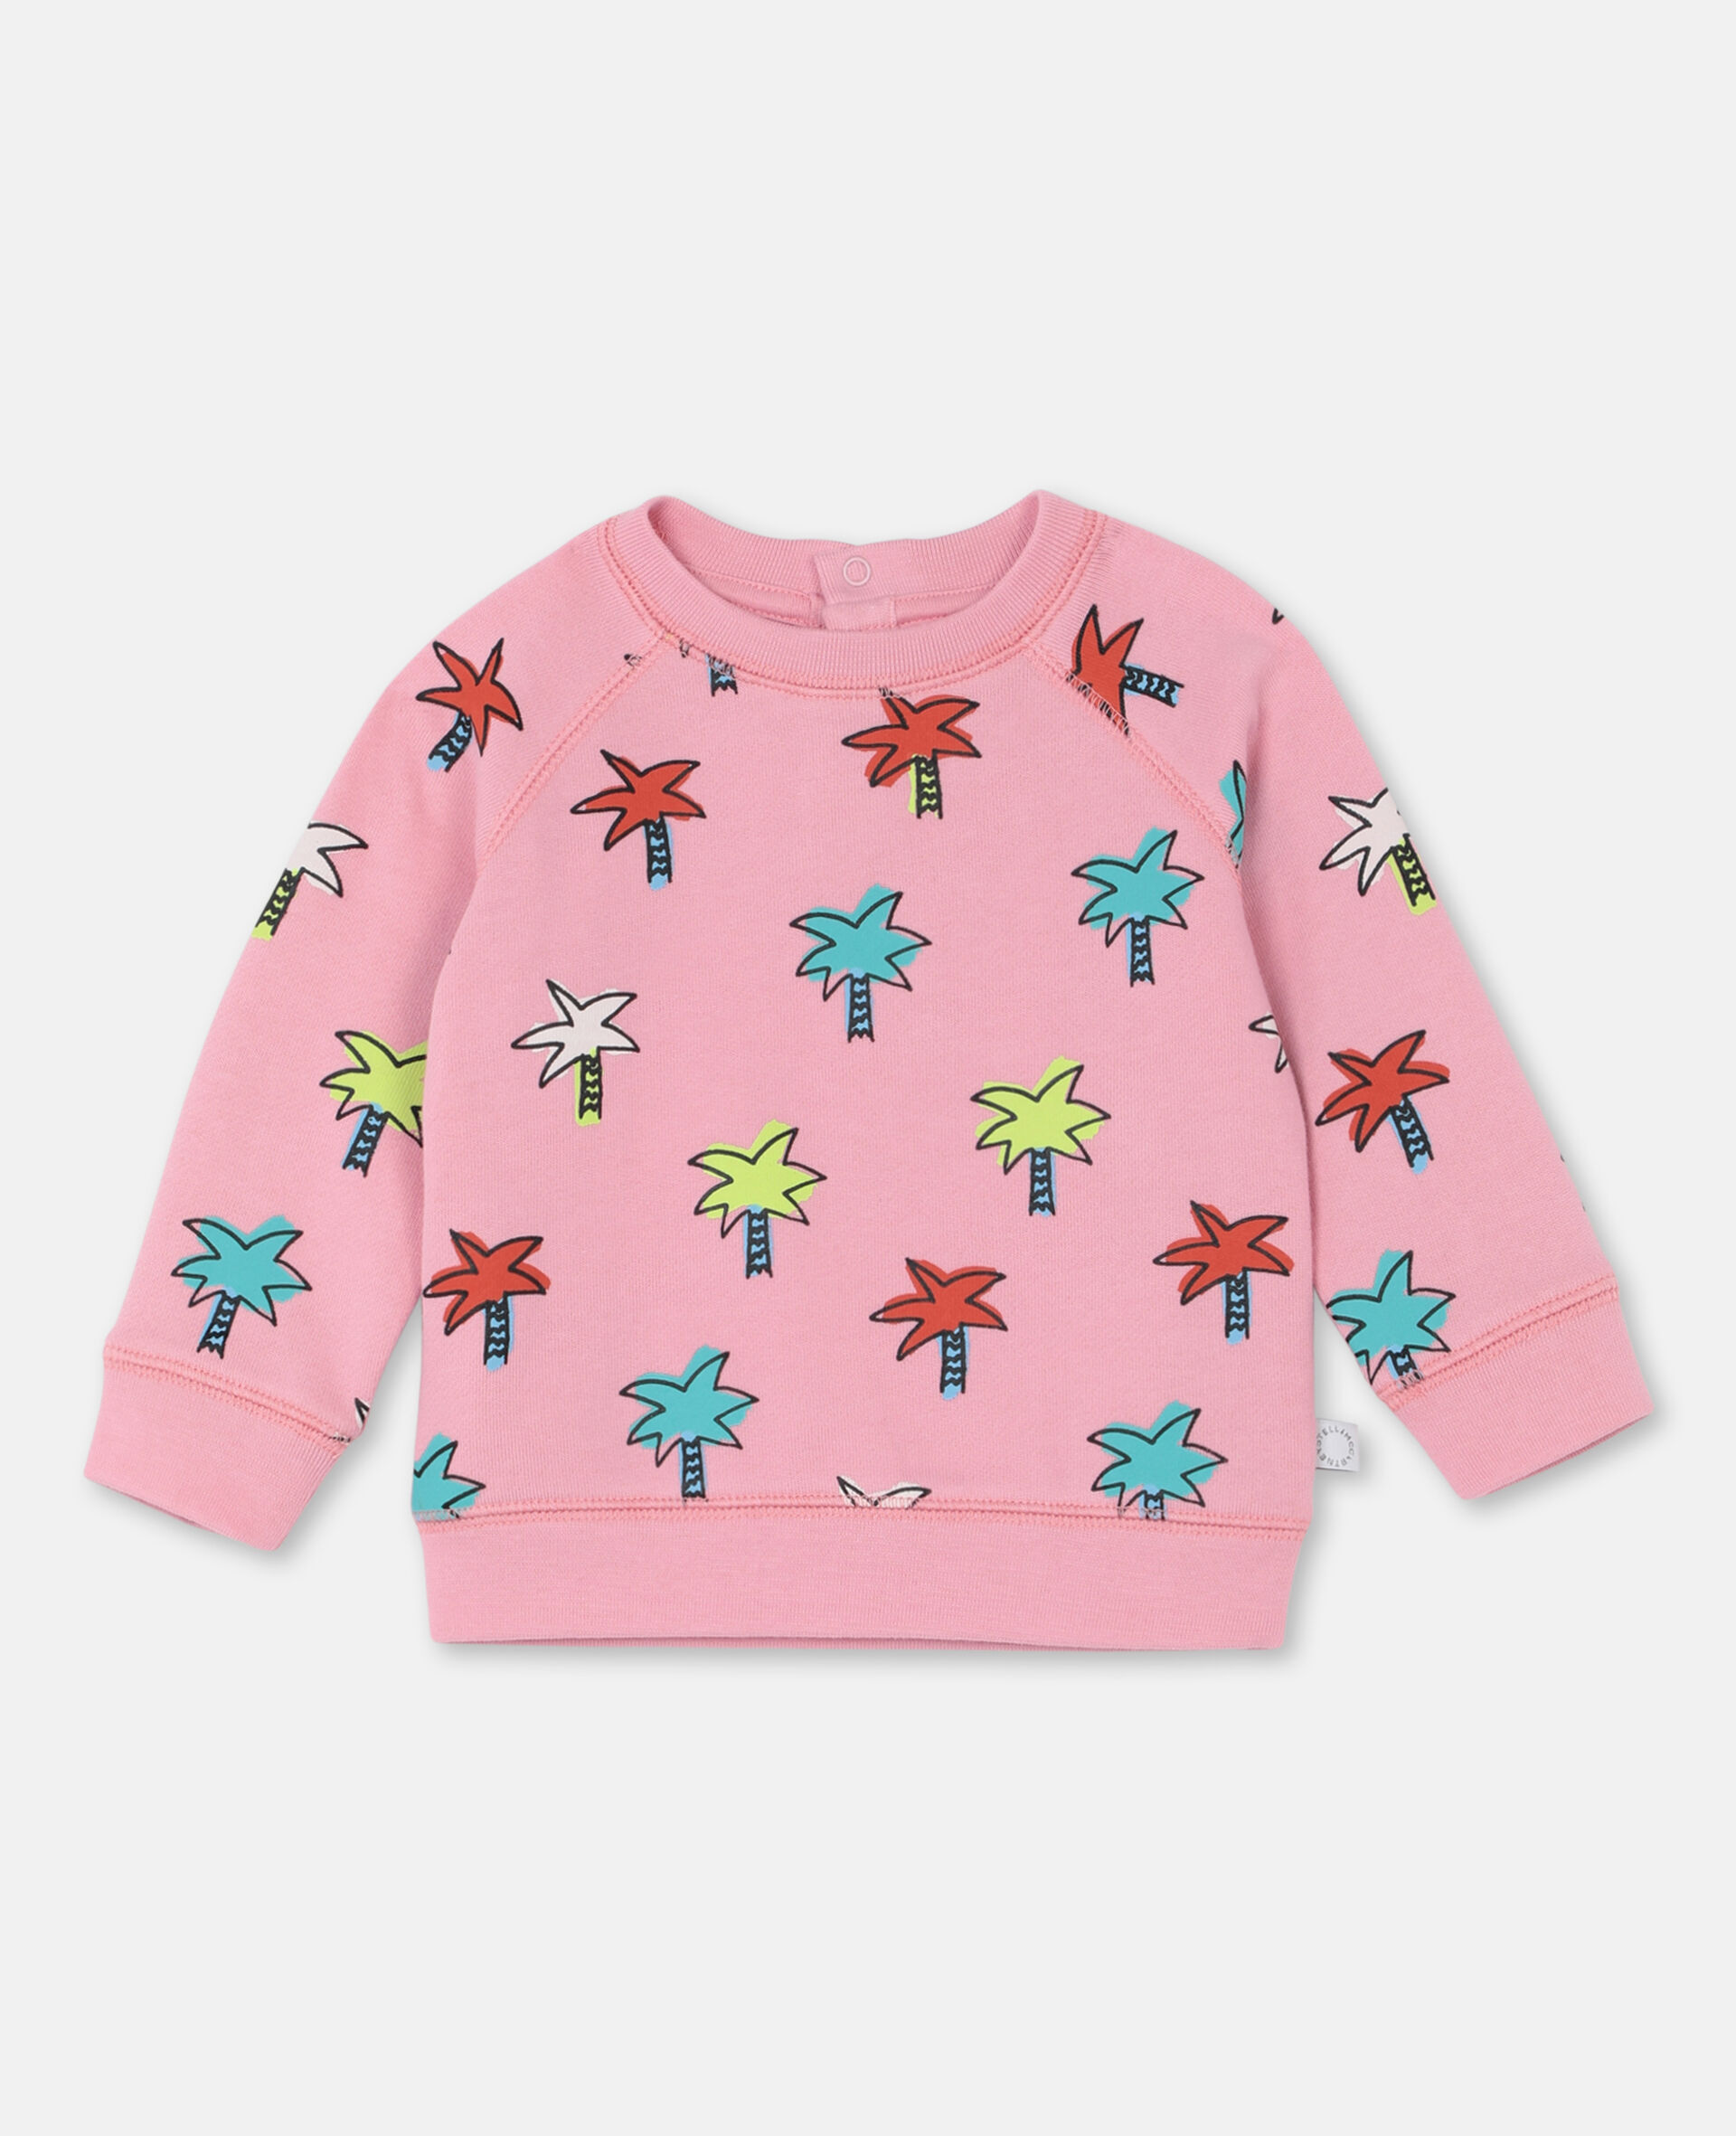 Doodly Palms Cotton Sweatshirt -Pink-large image number 0